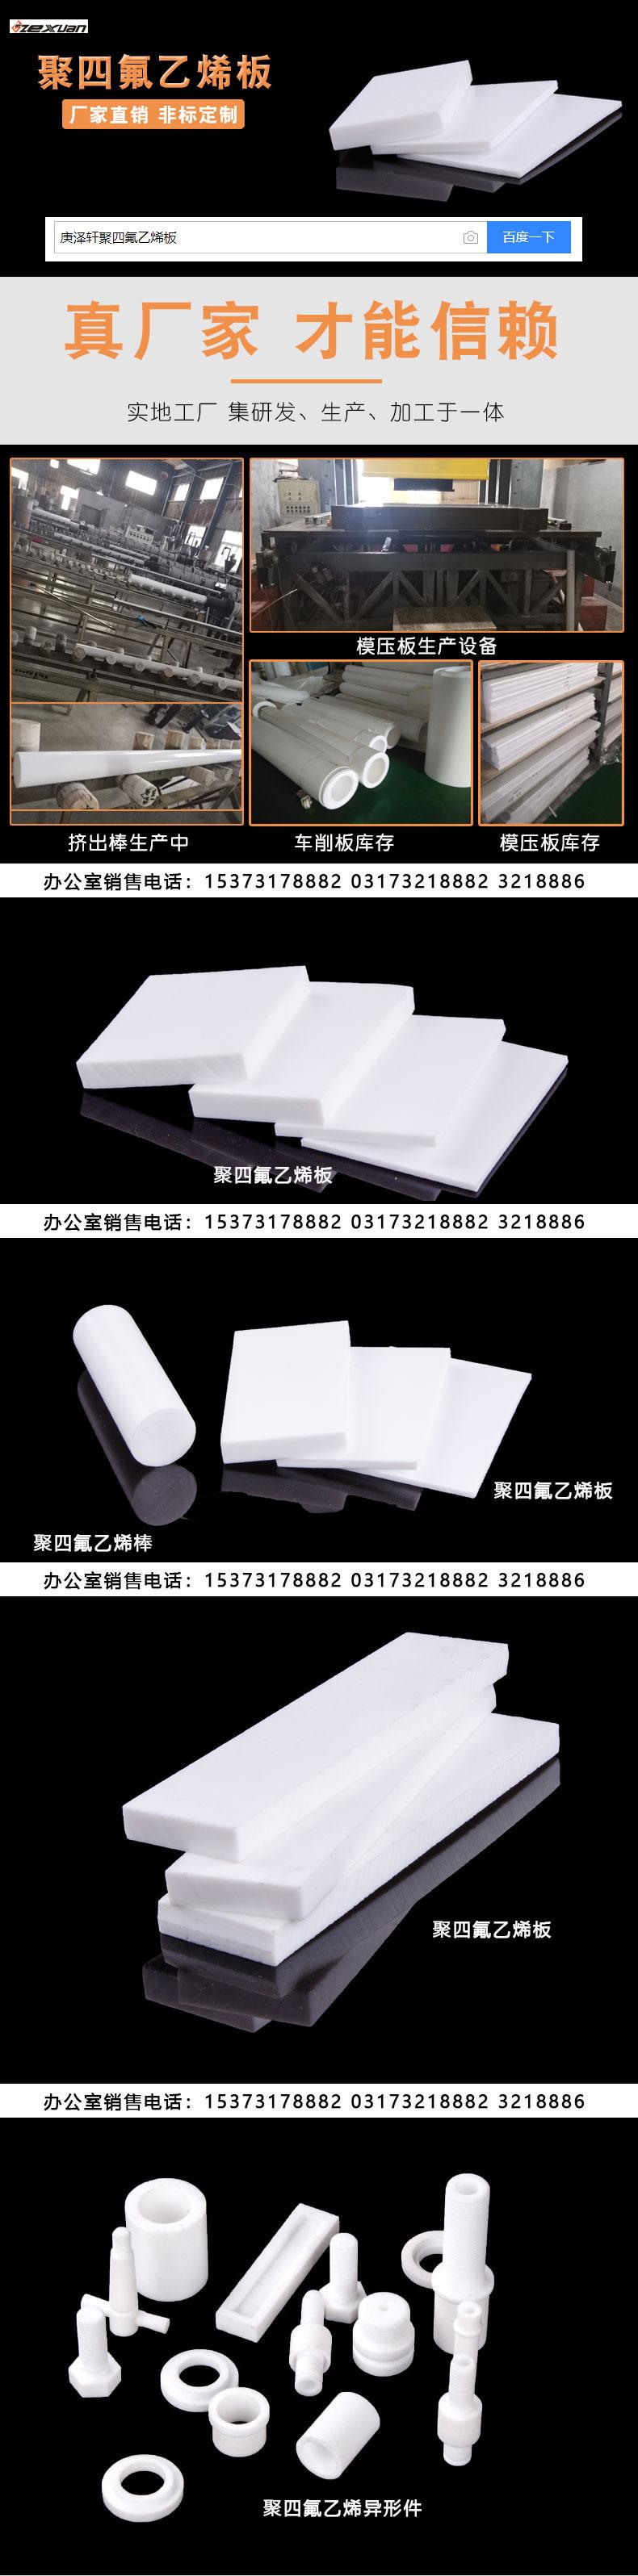 5mm聚四氟乙烯板